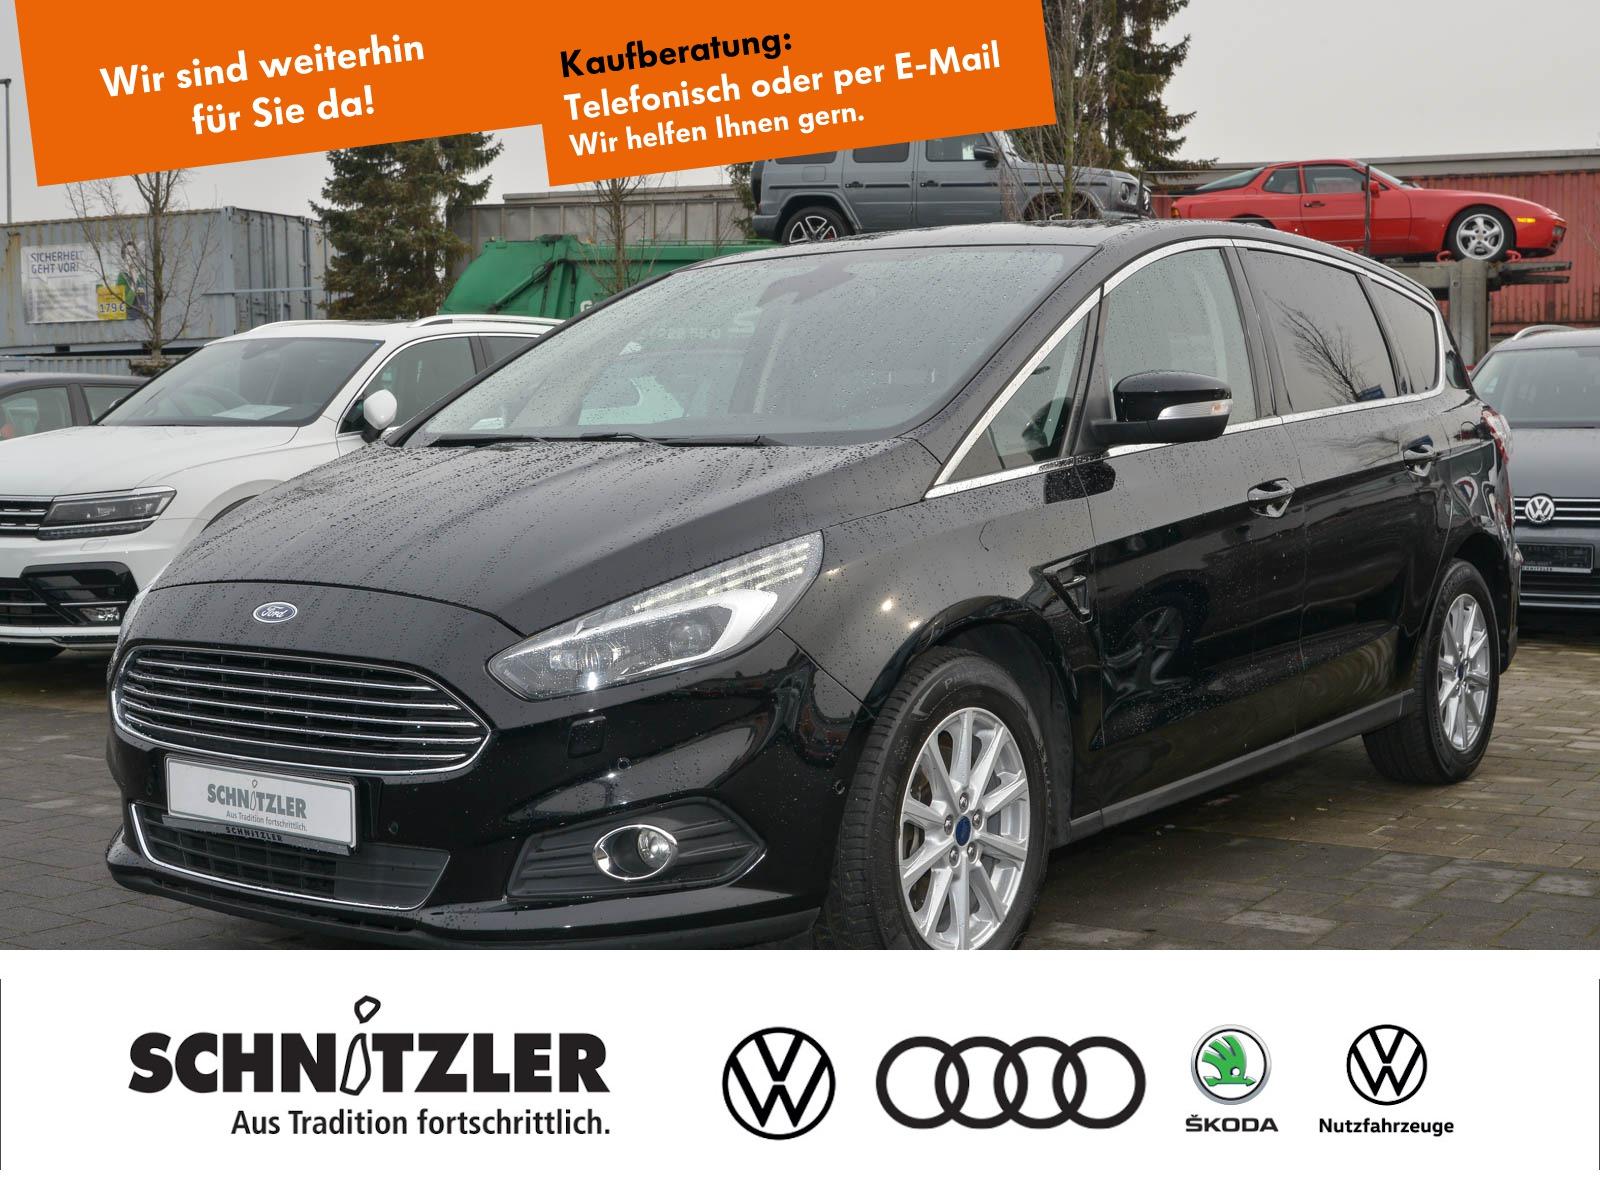 Ford S-Max 2.0 TDCi POWERSHIFT Titanium ACC/LED/PDC+++, Jahr 2017, Diesel